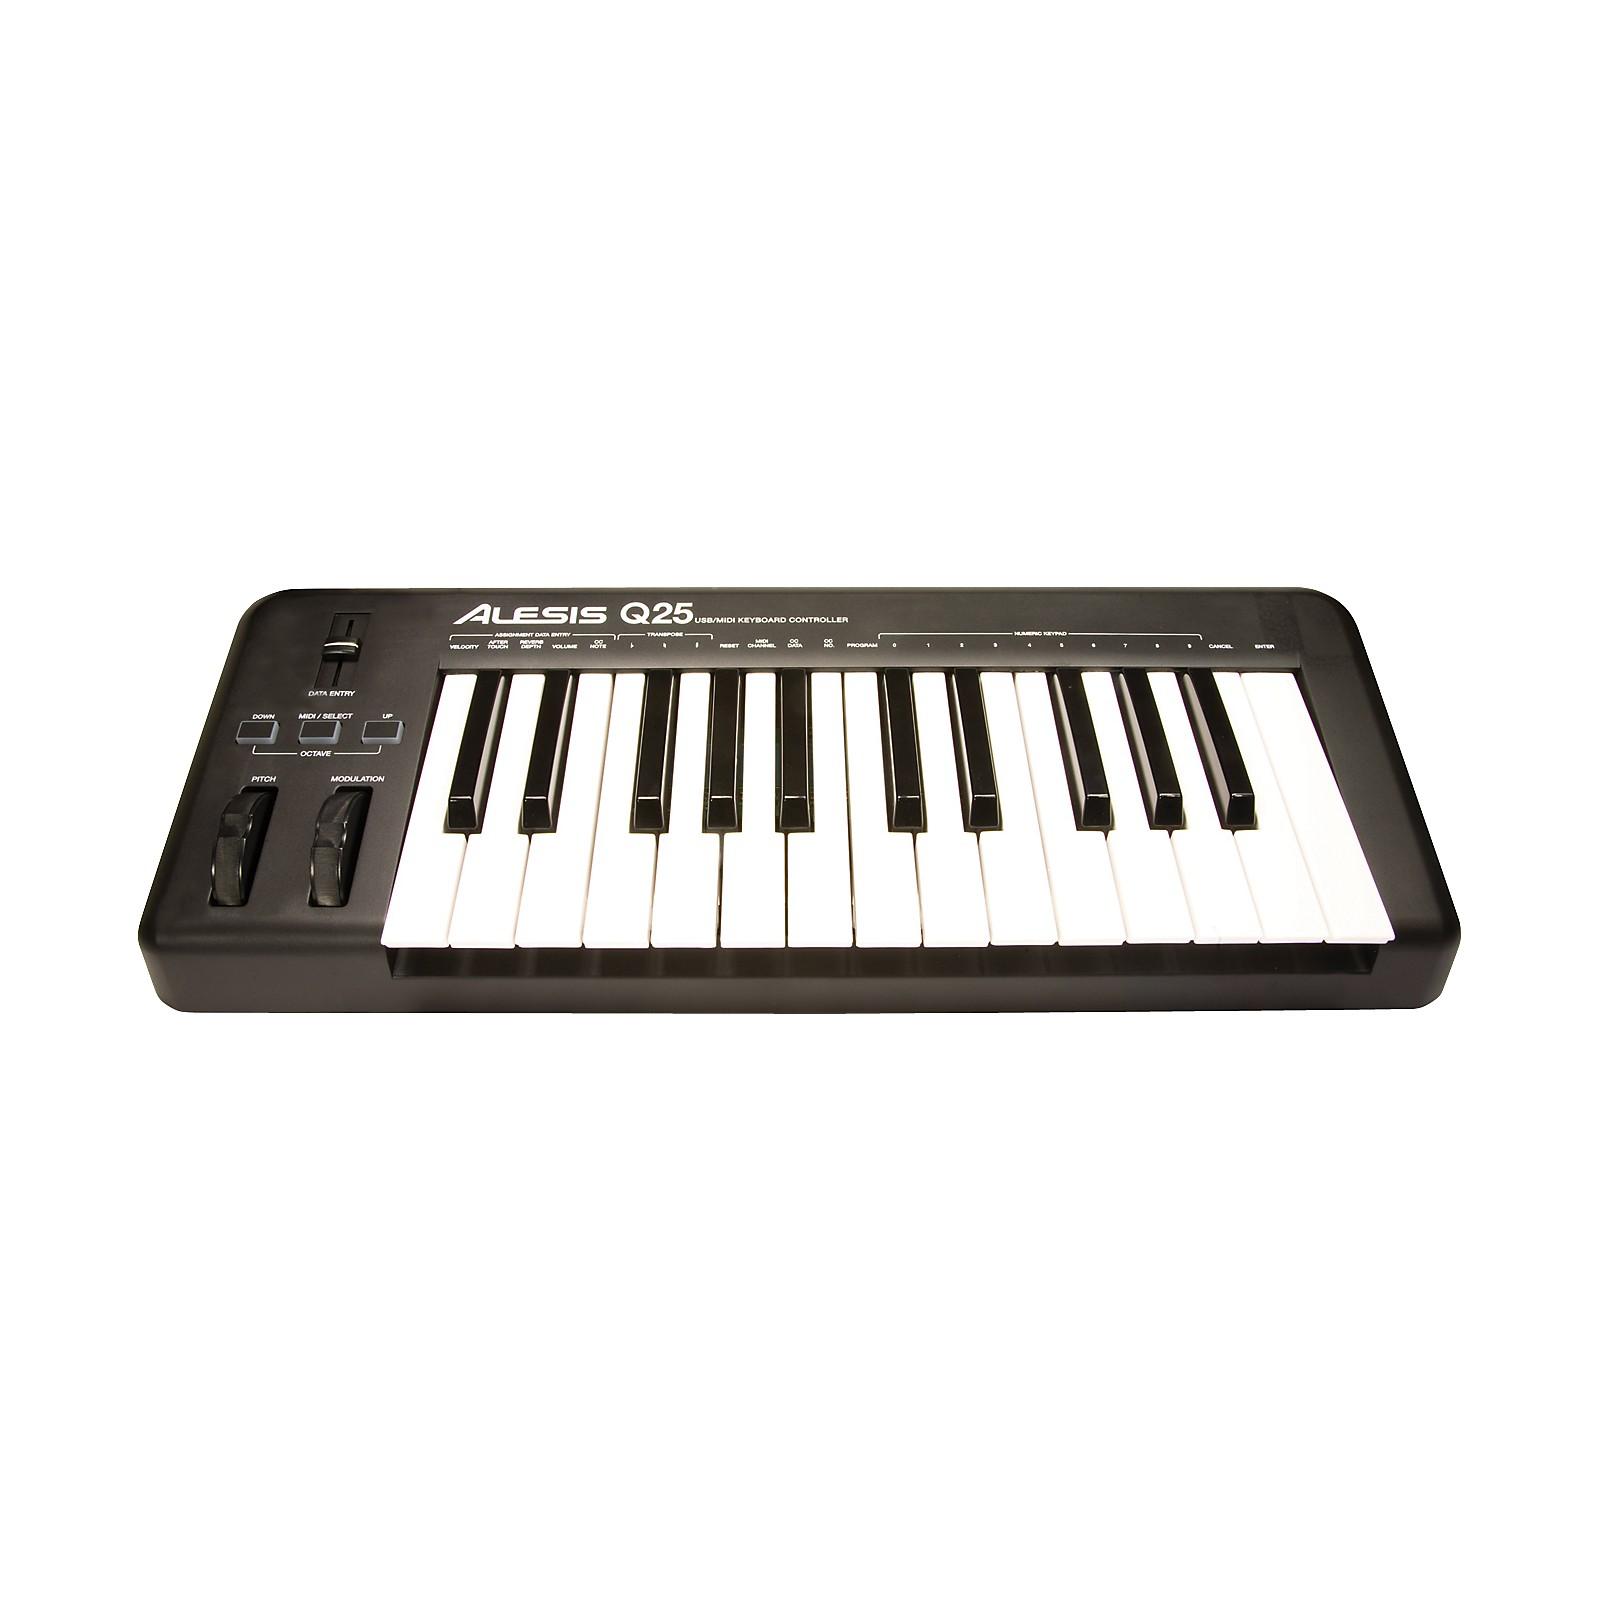 Open Box Alesis Q25 25-Key Keyboard MIDI Controller